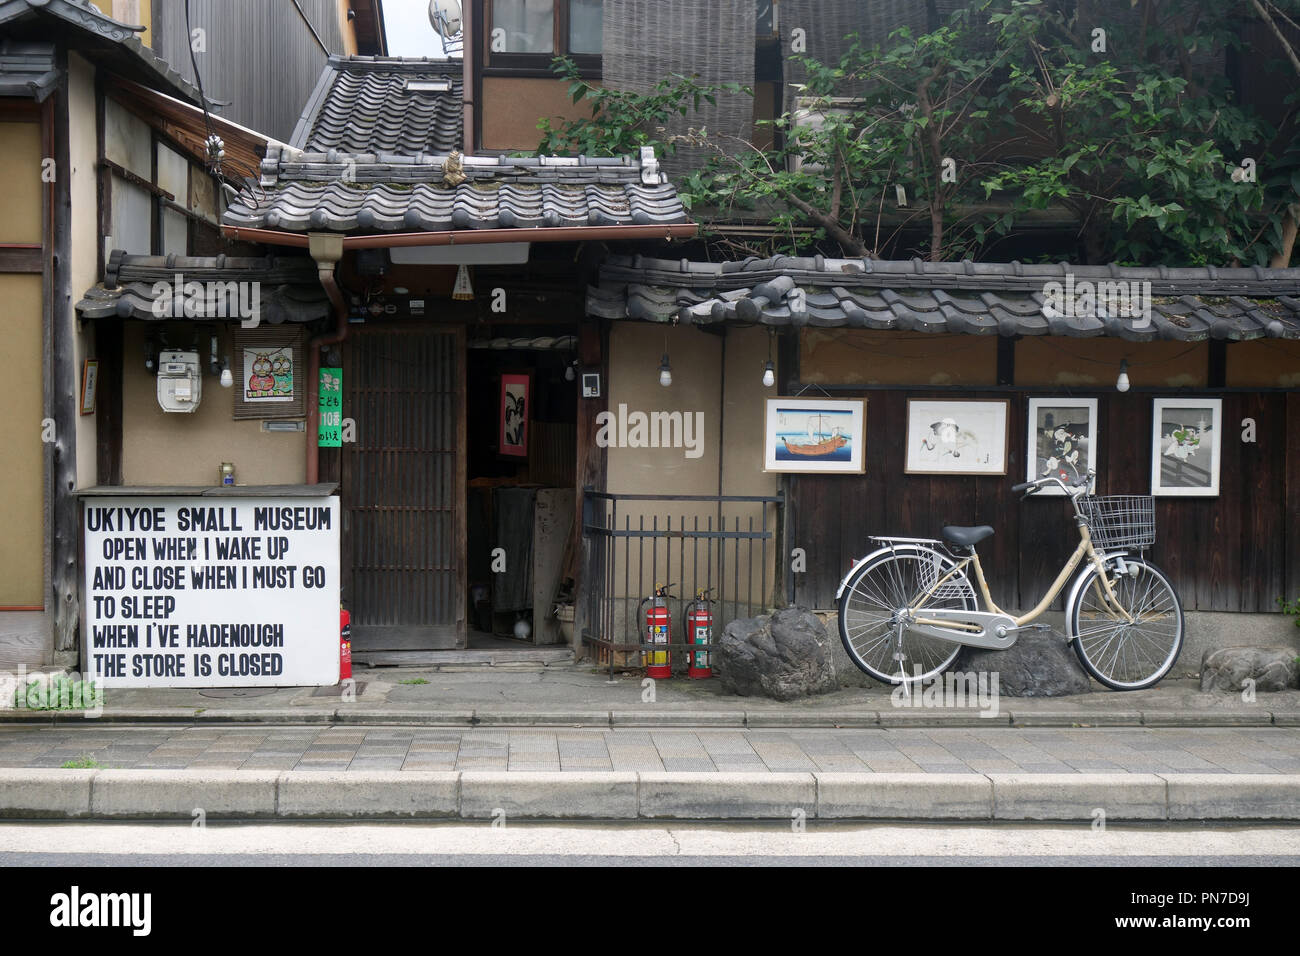 World's smallest Ukiyo-e museum, Gion, Kyoto, Japan. No PR - Stock Image